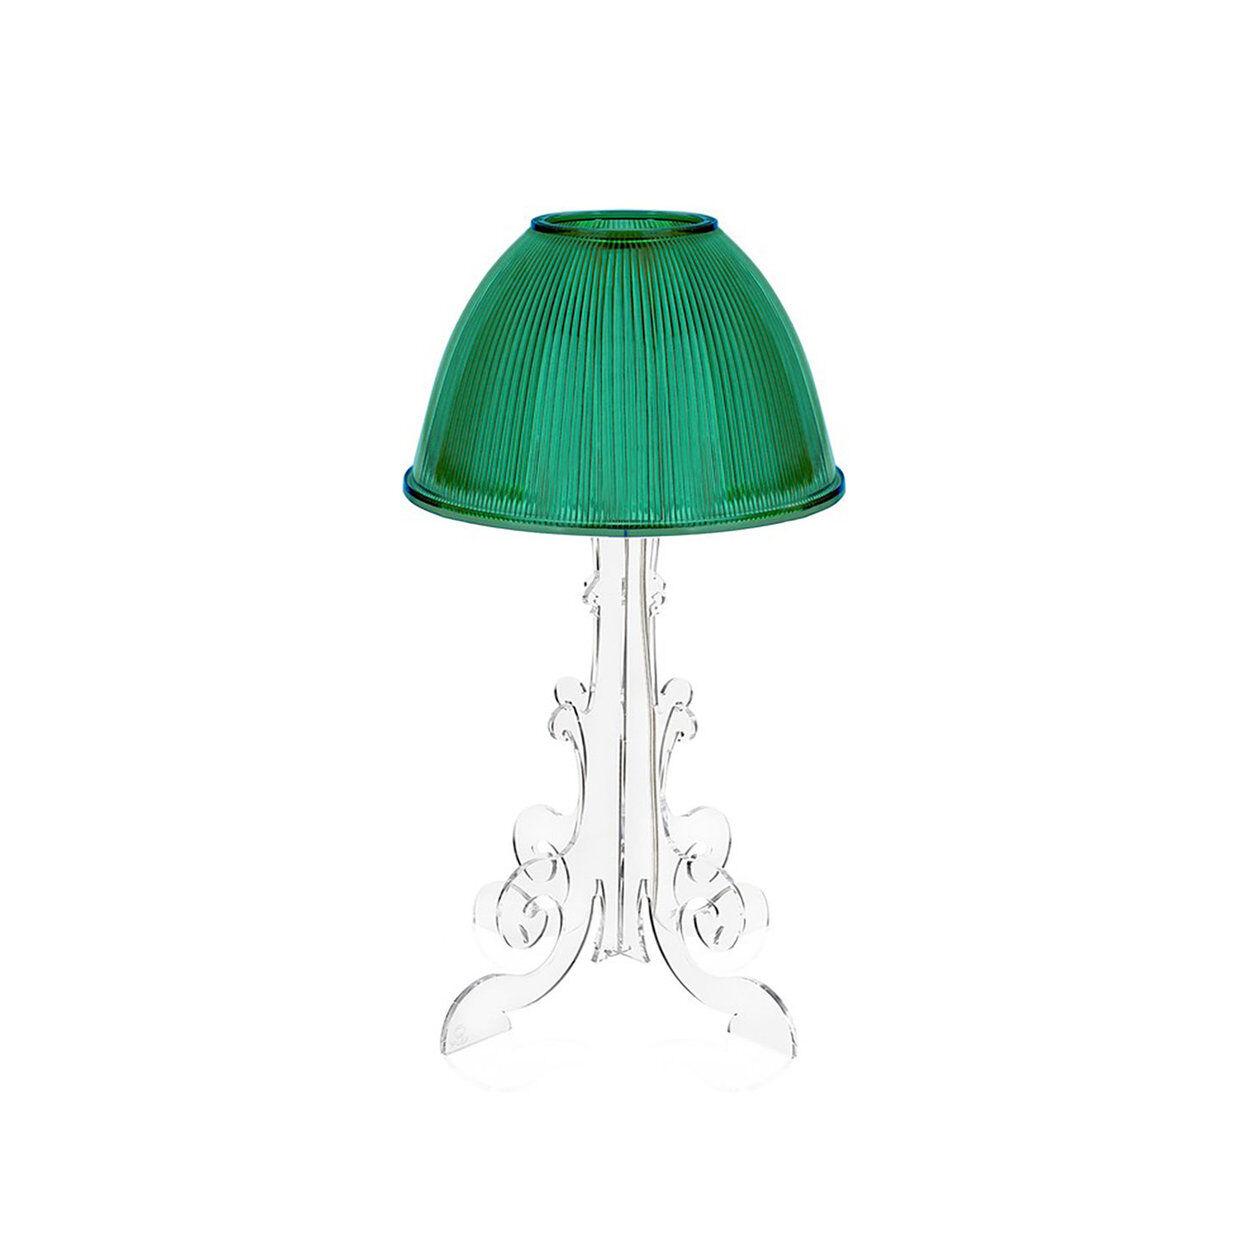 Iplex Lampada da tavolo Cancan 19, verde trasparente